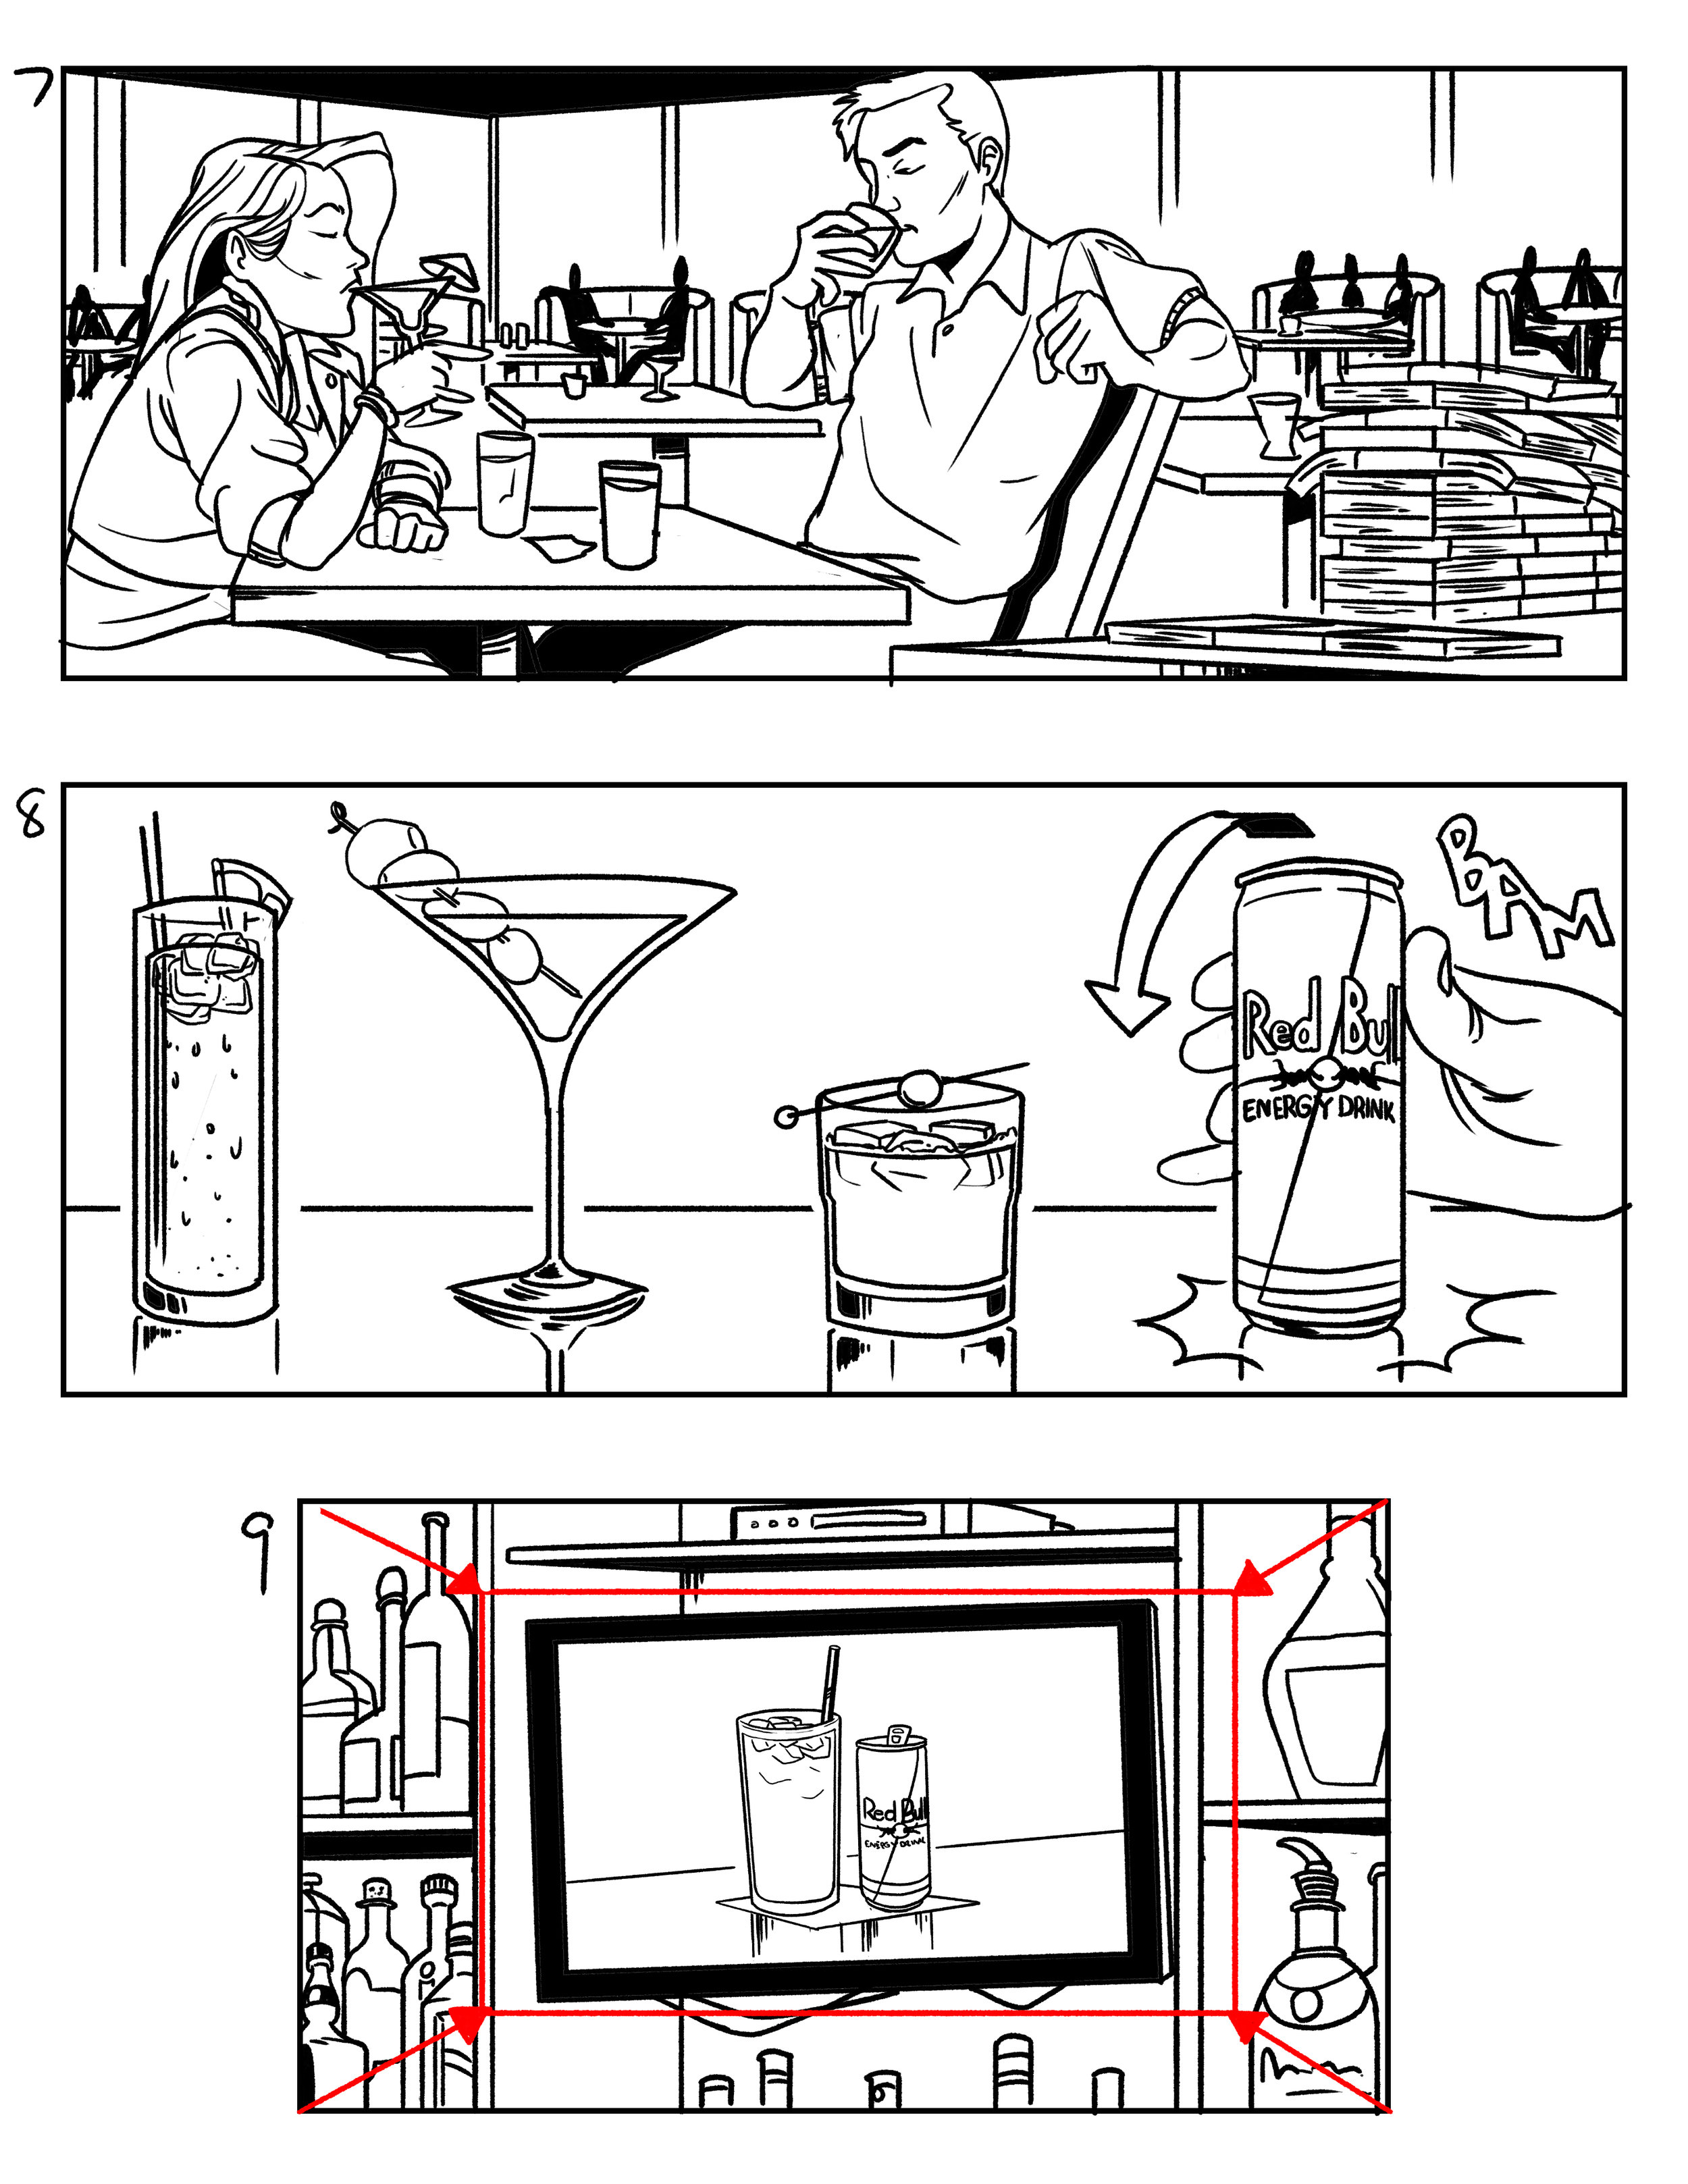 FF_StoryboardTest_3.jpg